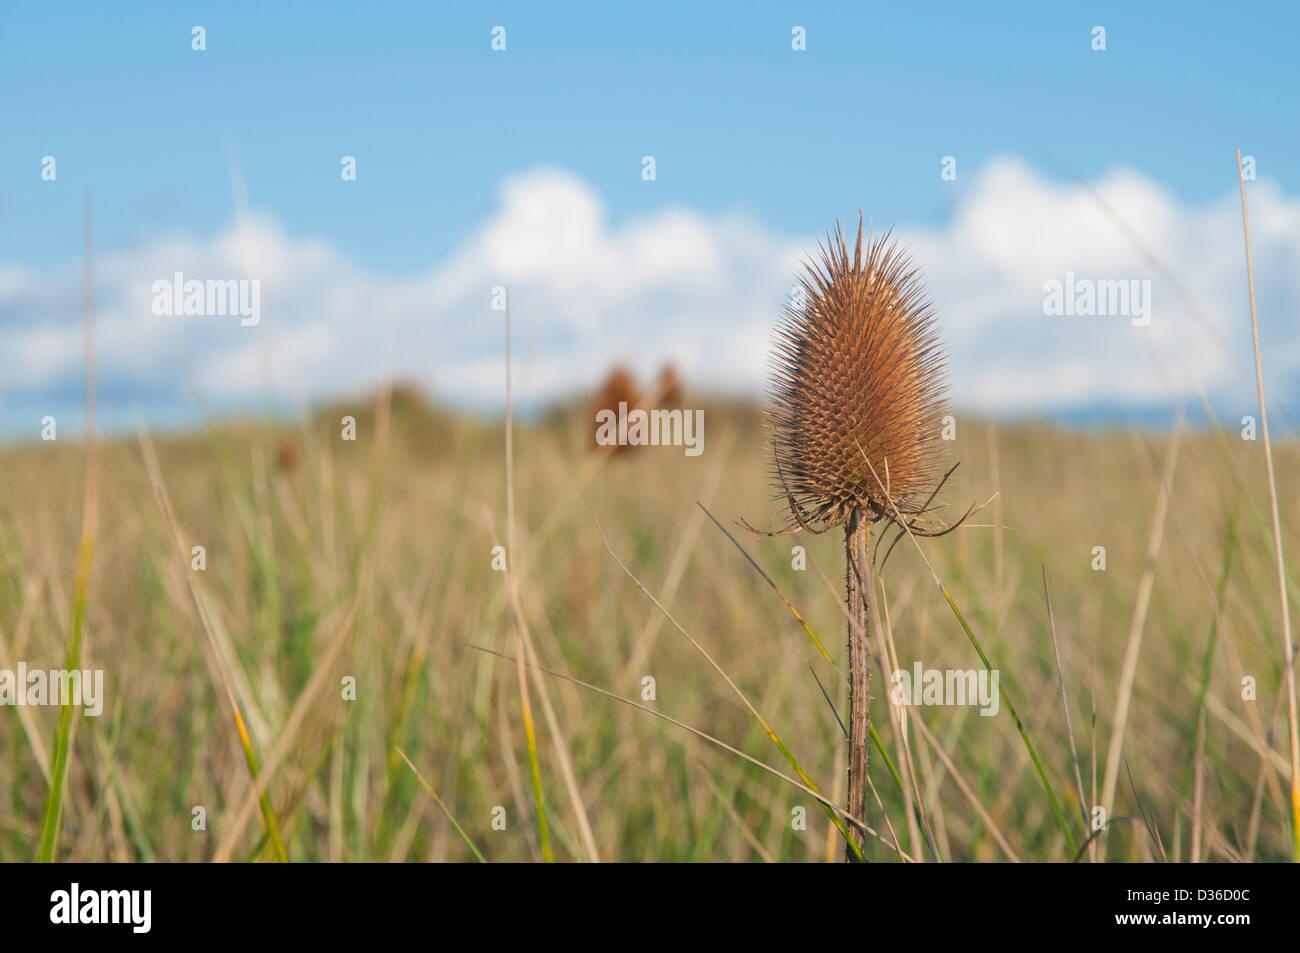 A dried wild teasel (Dipsacus fullonum) head in an autumn meadow in Scotland. Sometimes spelled teazel or teazle. - Stock Image